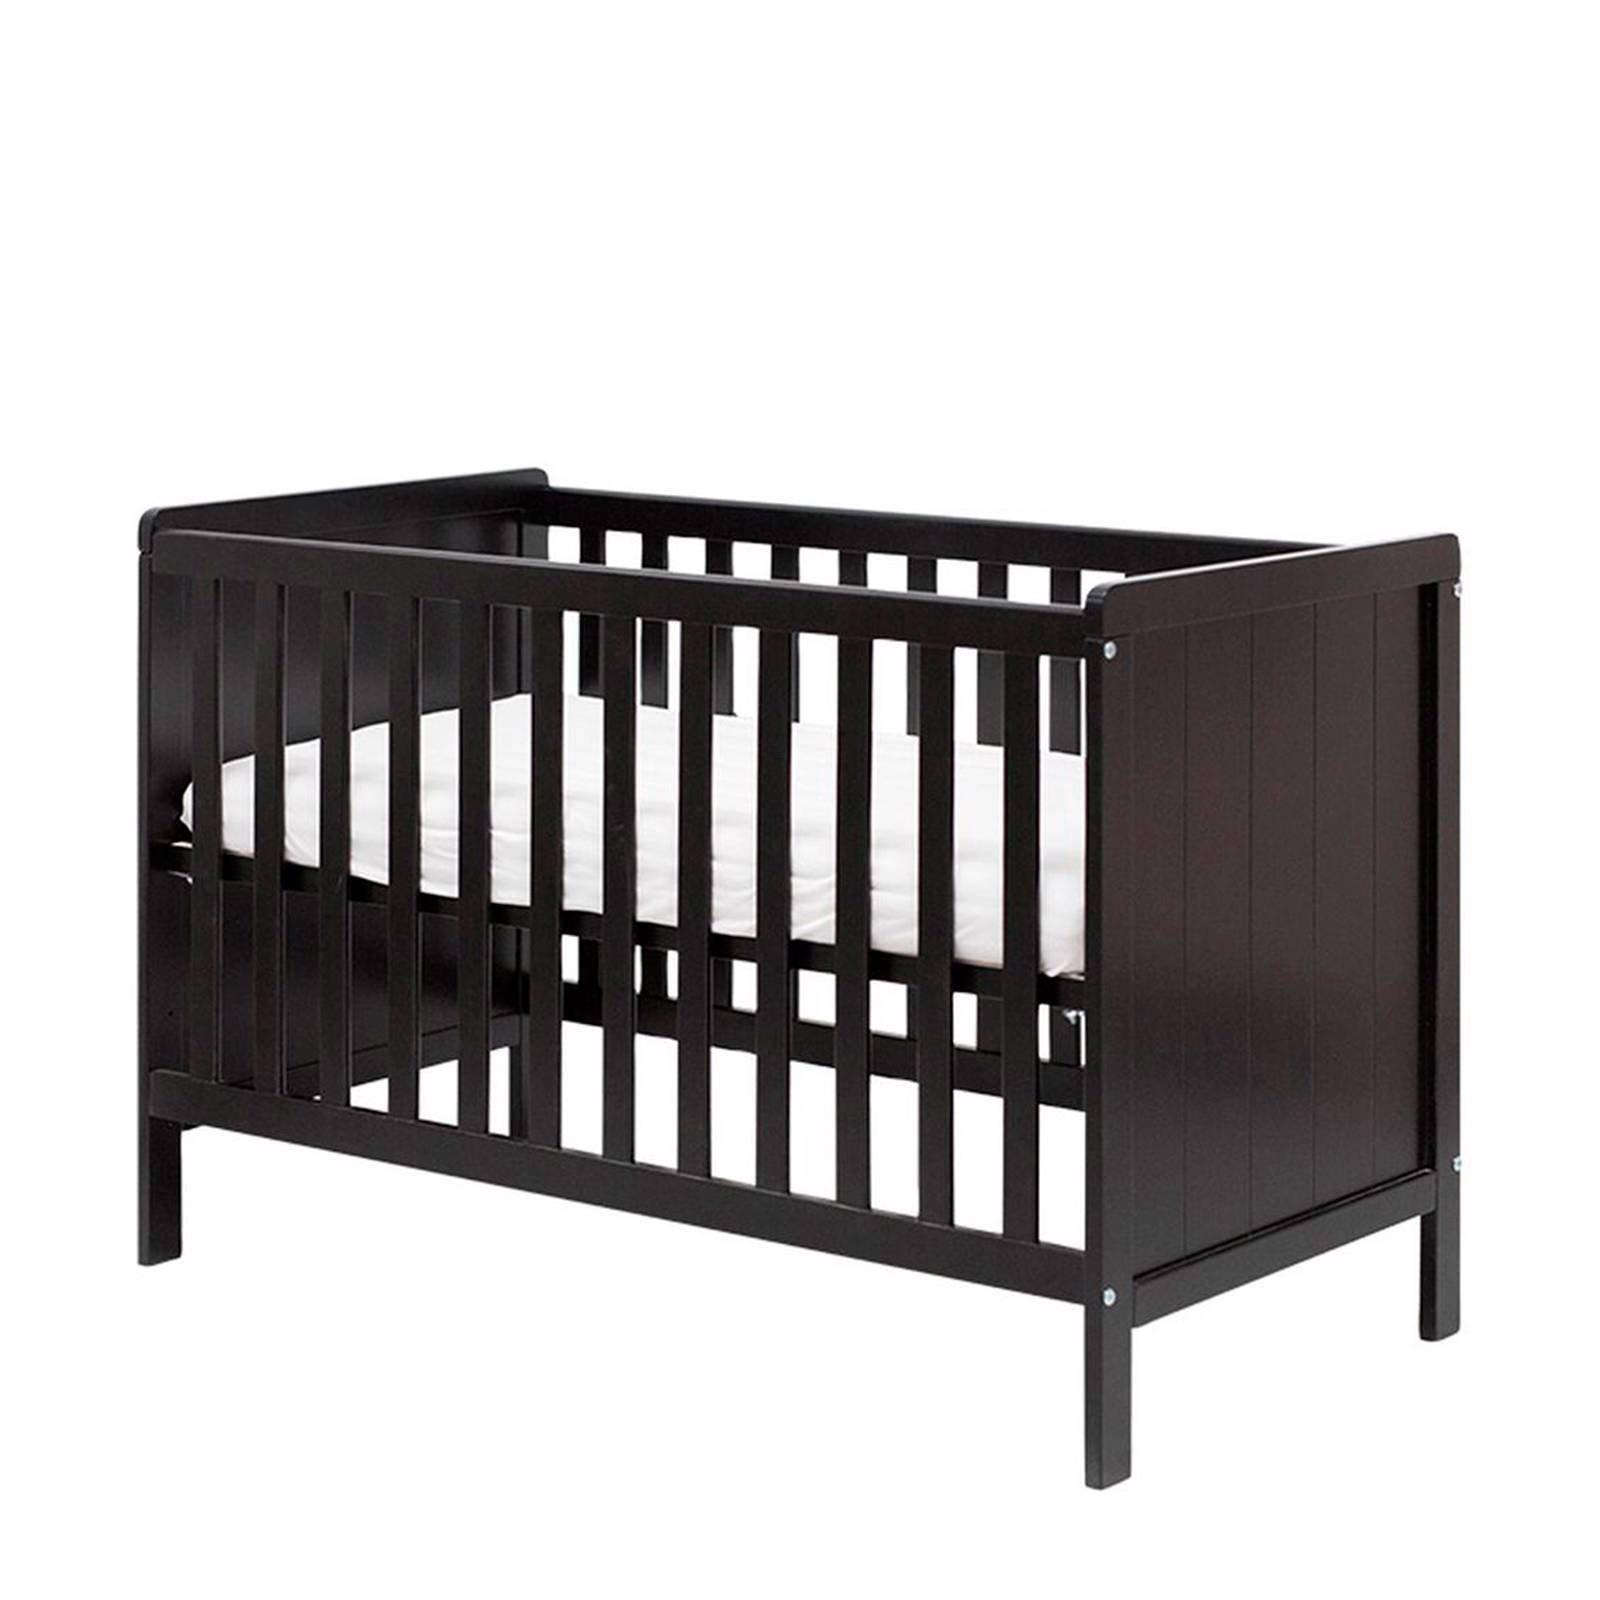 Baby Ledikant Zwart.Basicline Ralph Ledikant 60x120 Cm Zwart Wehkamp